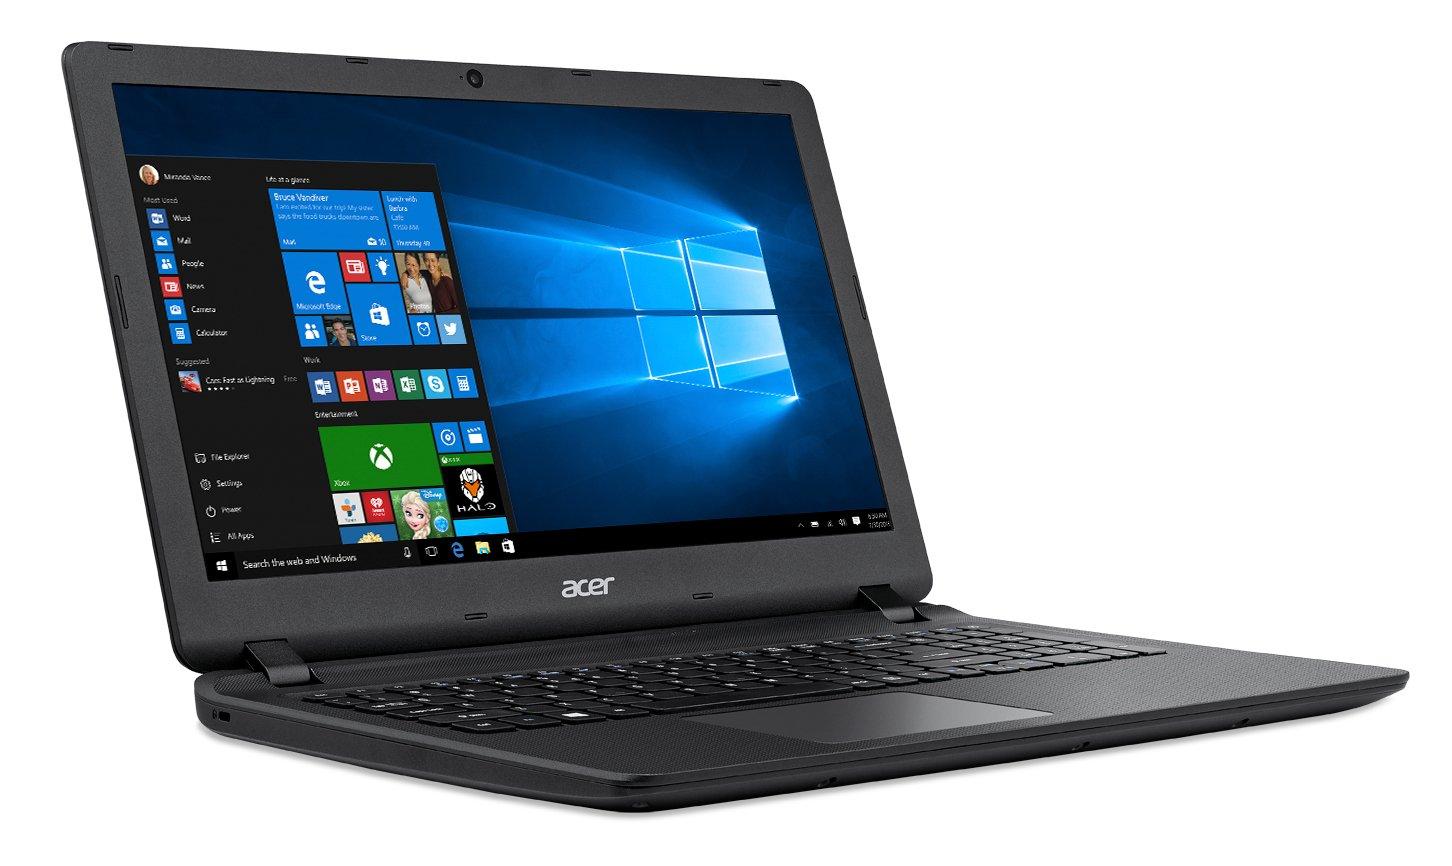 Acer Aspire ES 15 gaming laptop